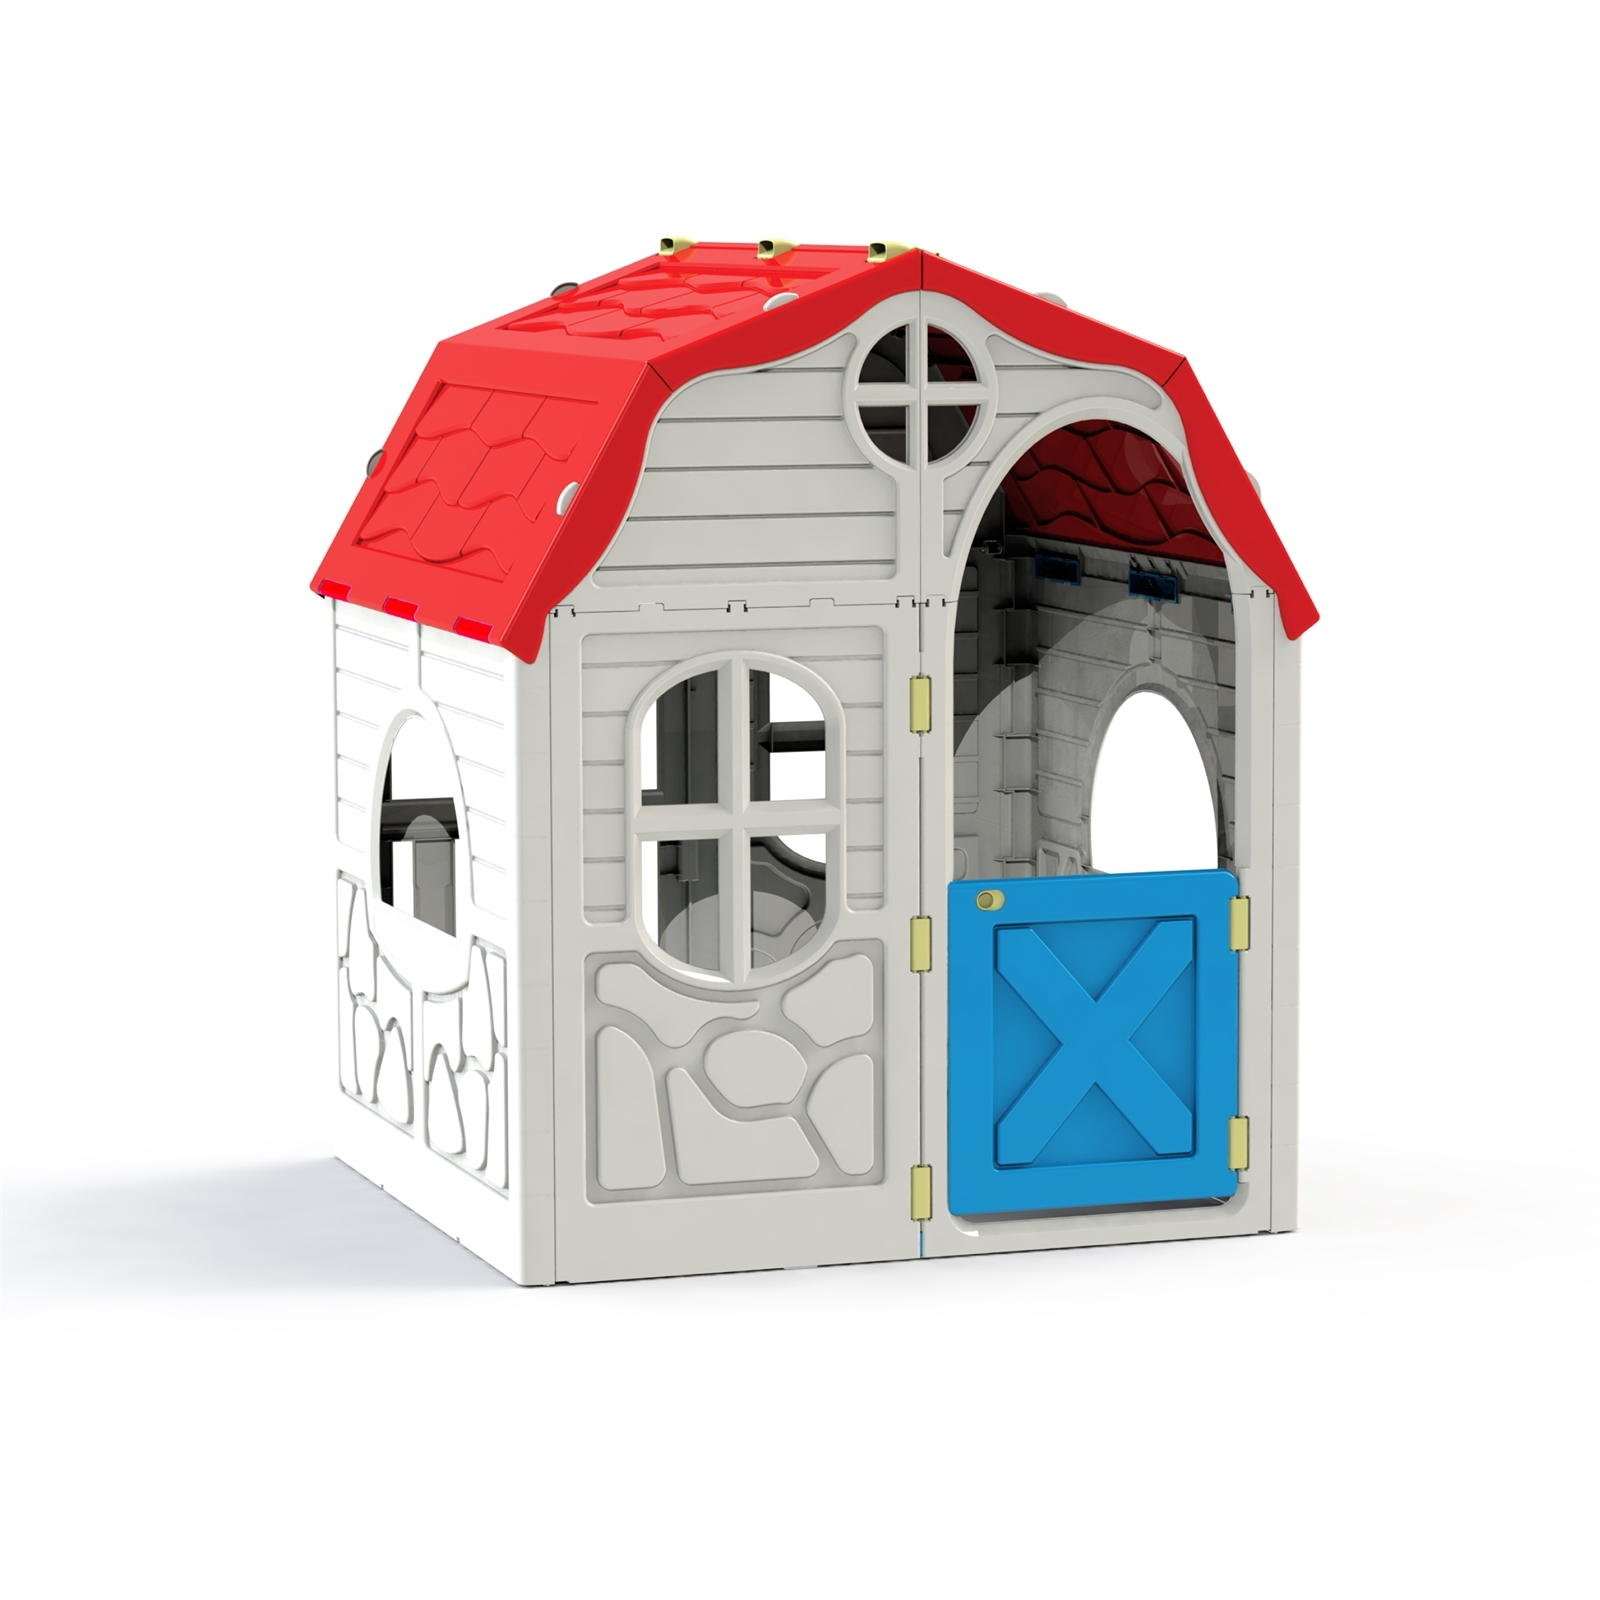 RAM 98 x 91 x 115cm Cubby House Country